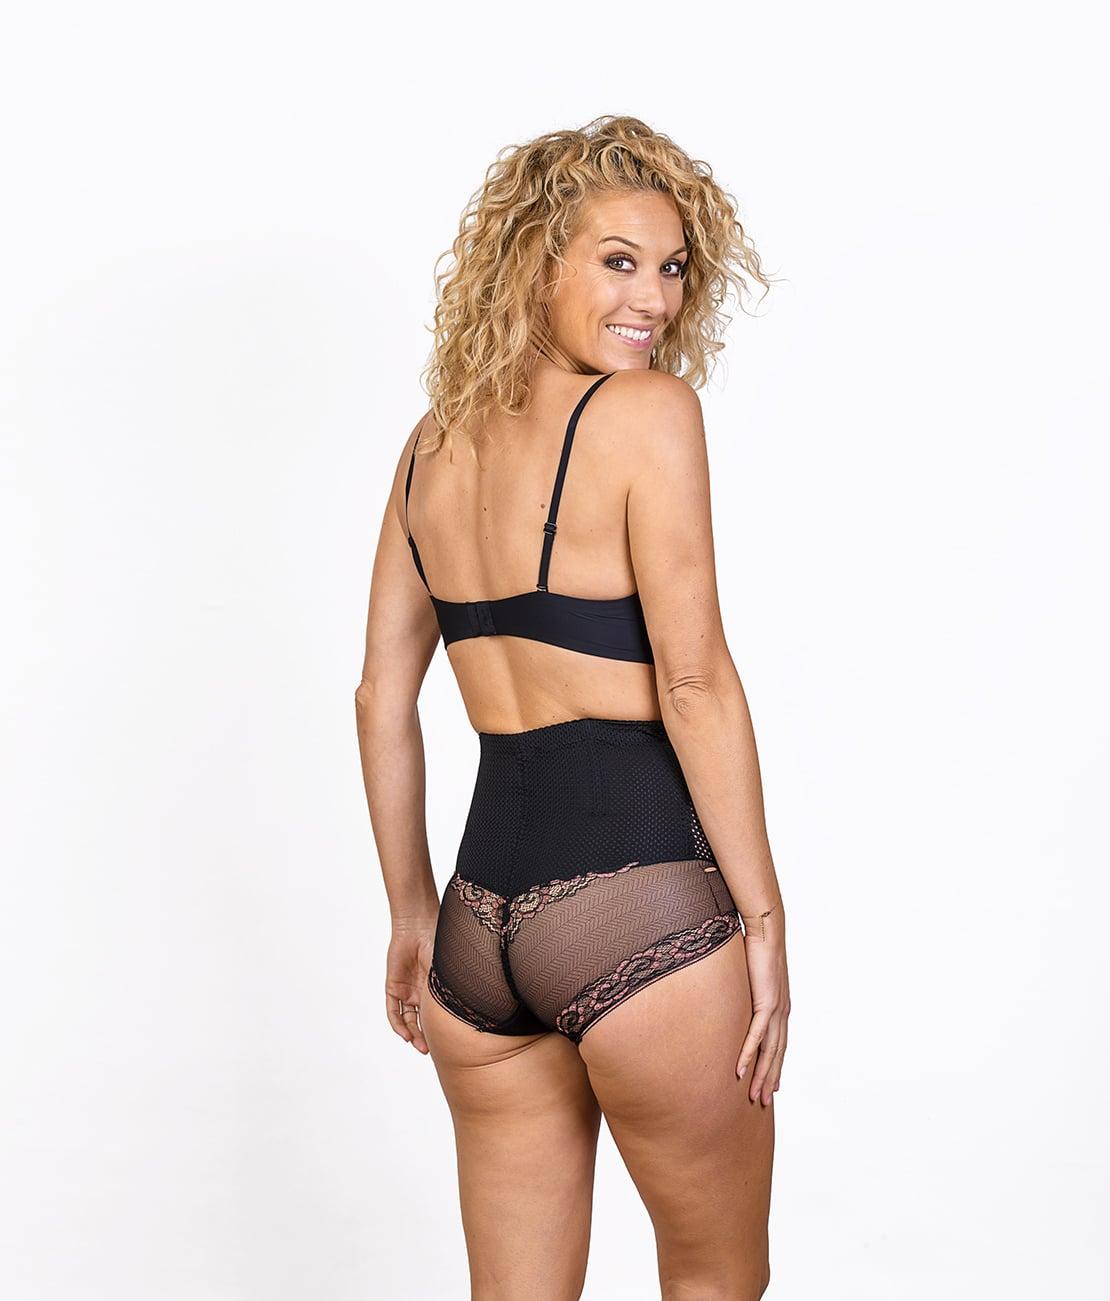 Shorty Gainant Sexy Noir Trois Quart Dos